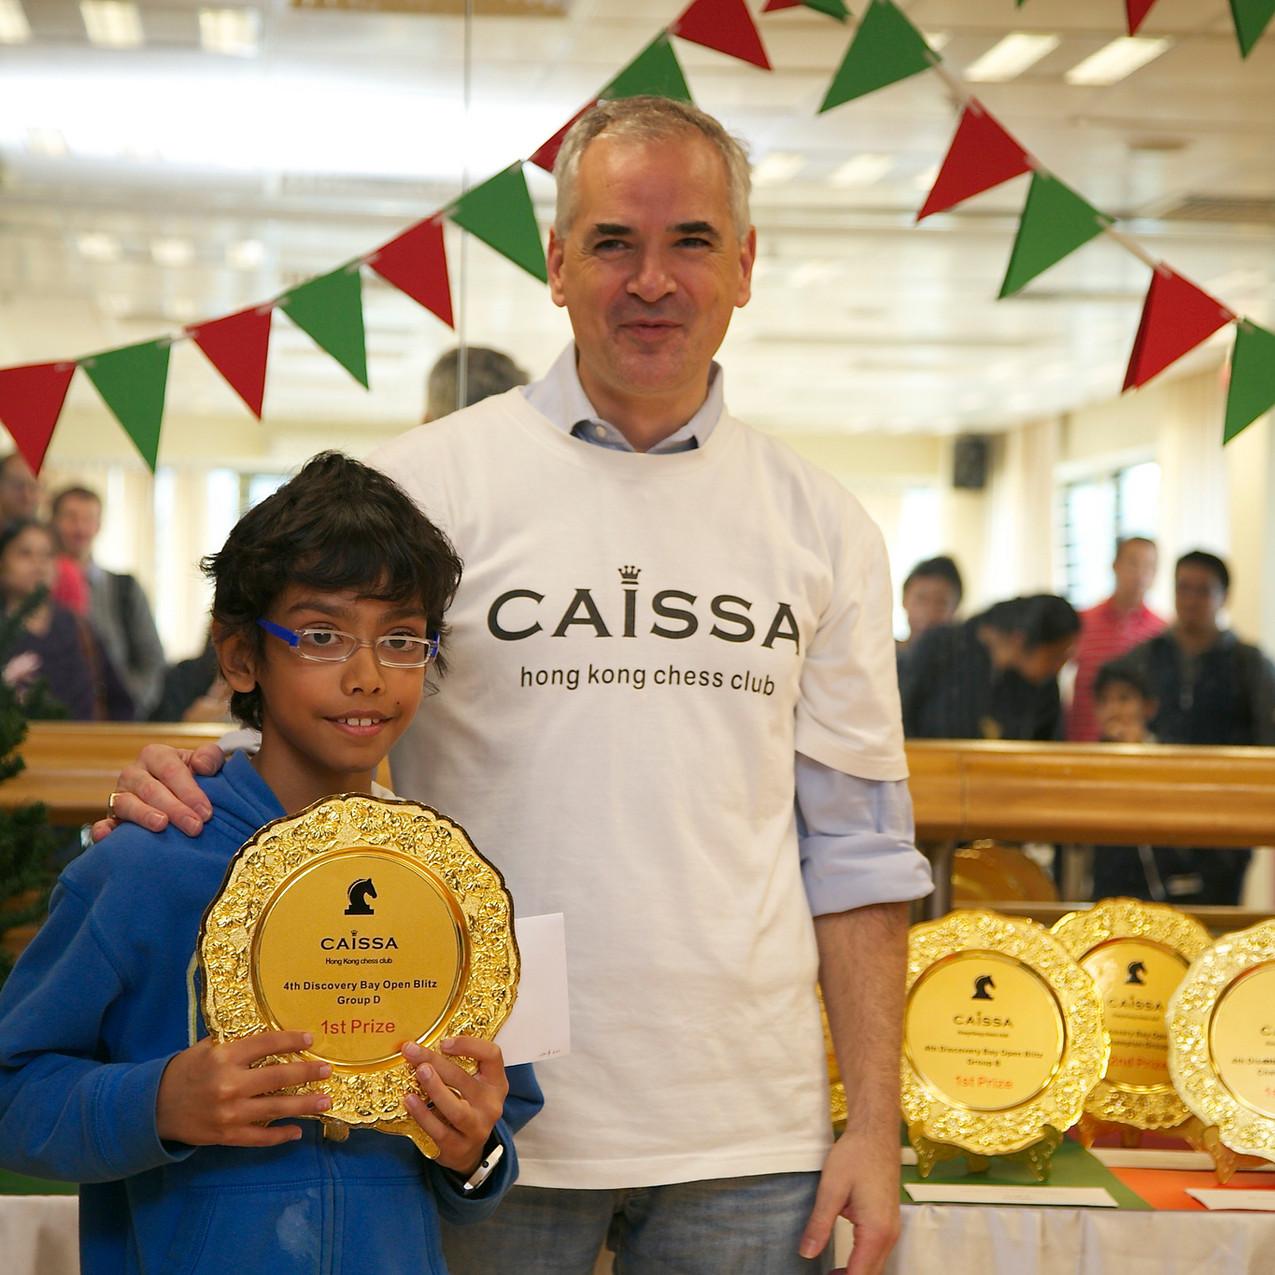 Group D - Aaditya 1st Prize